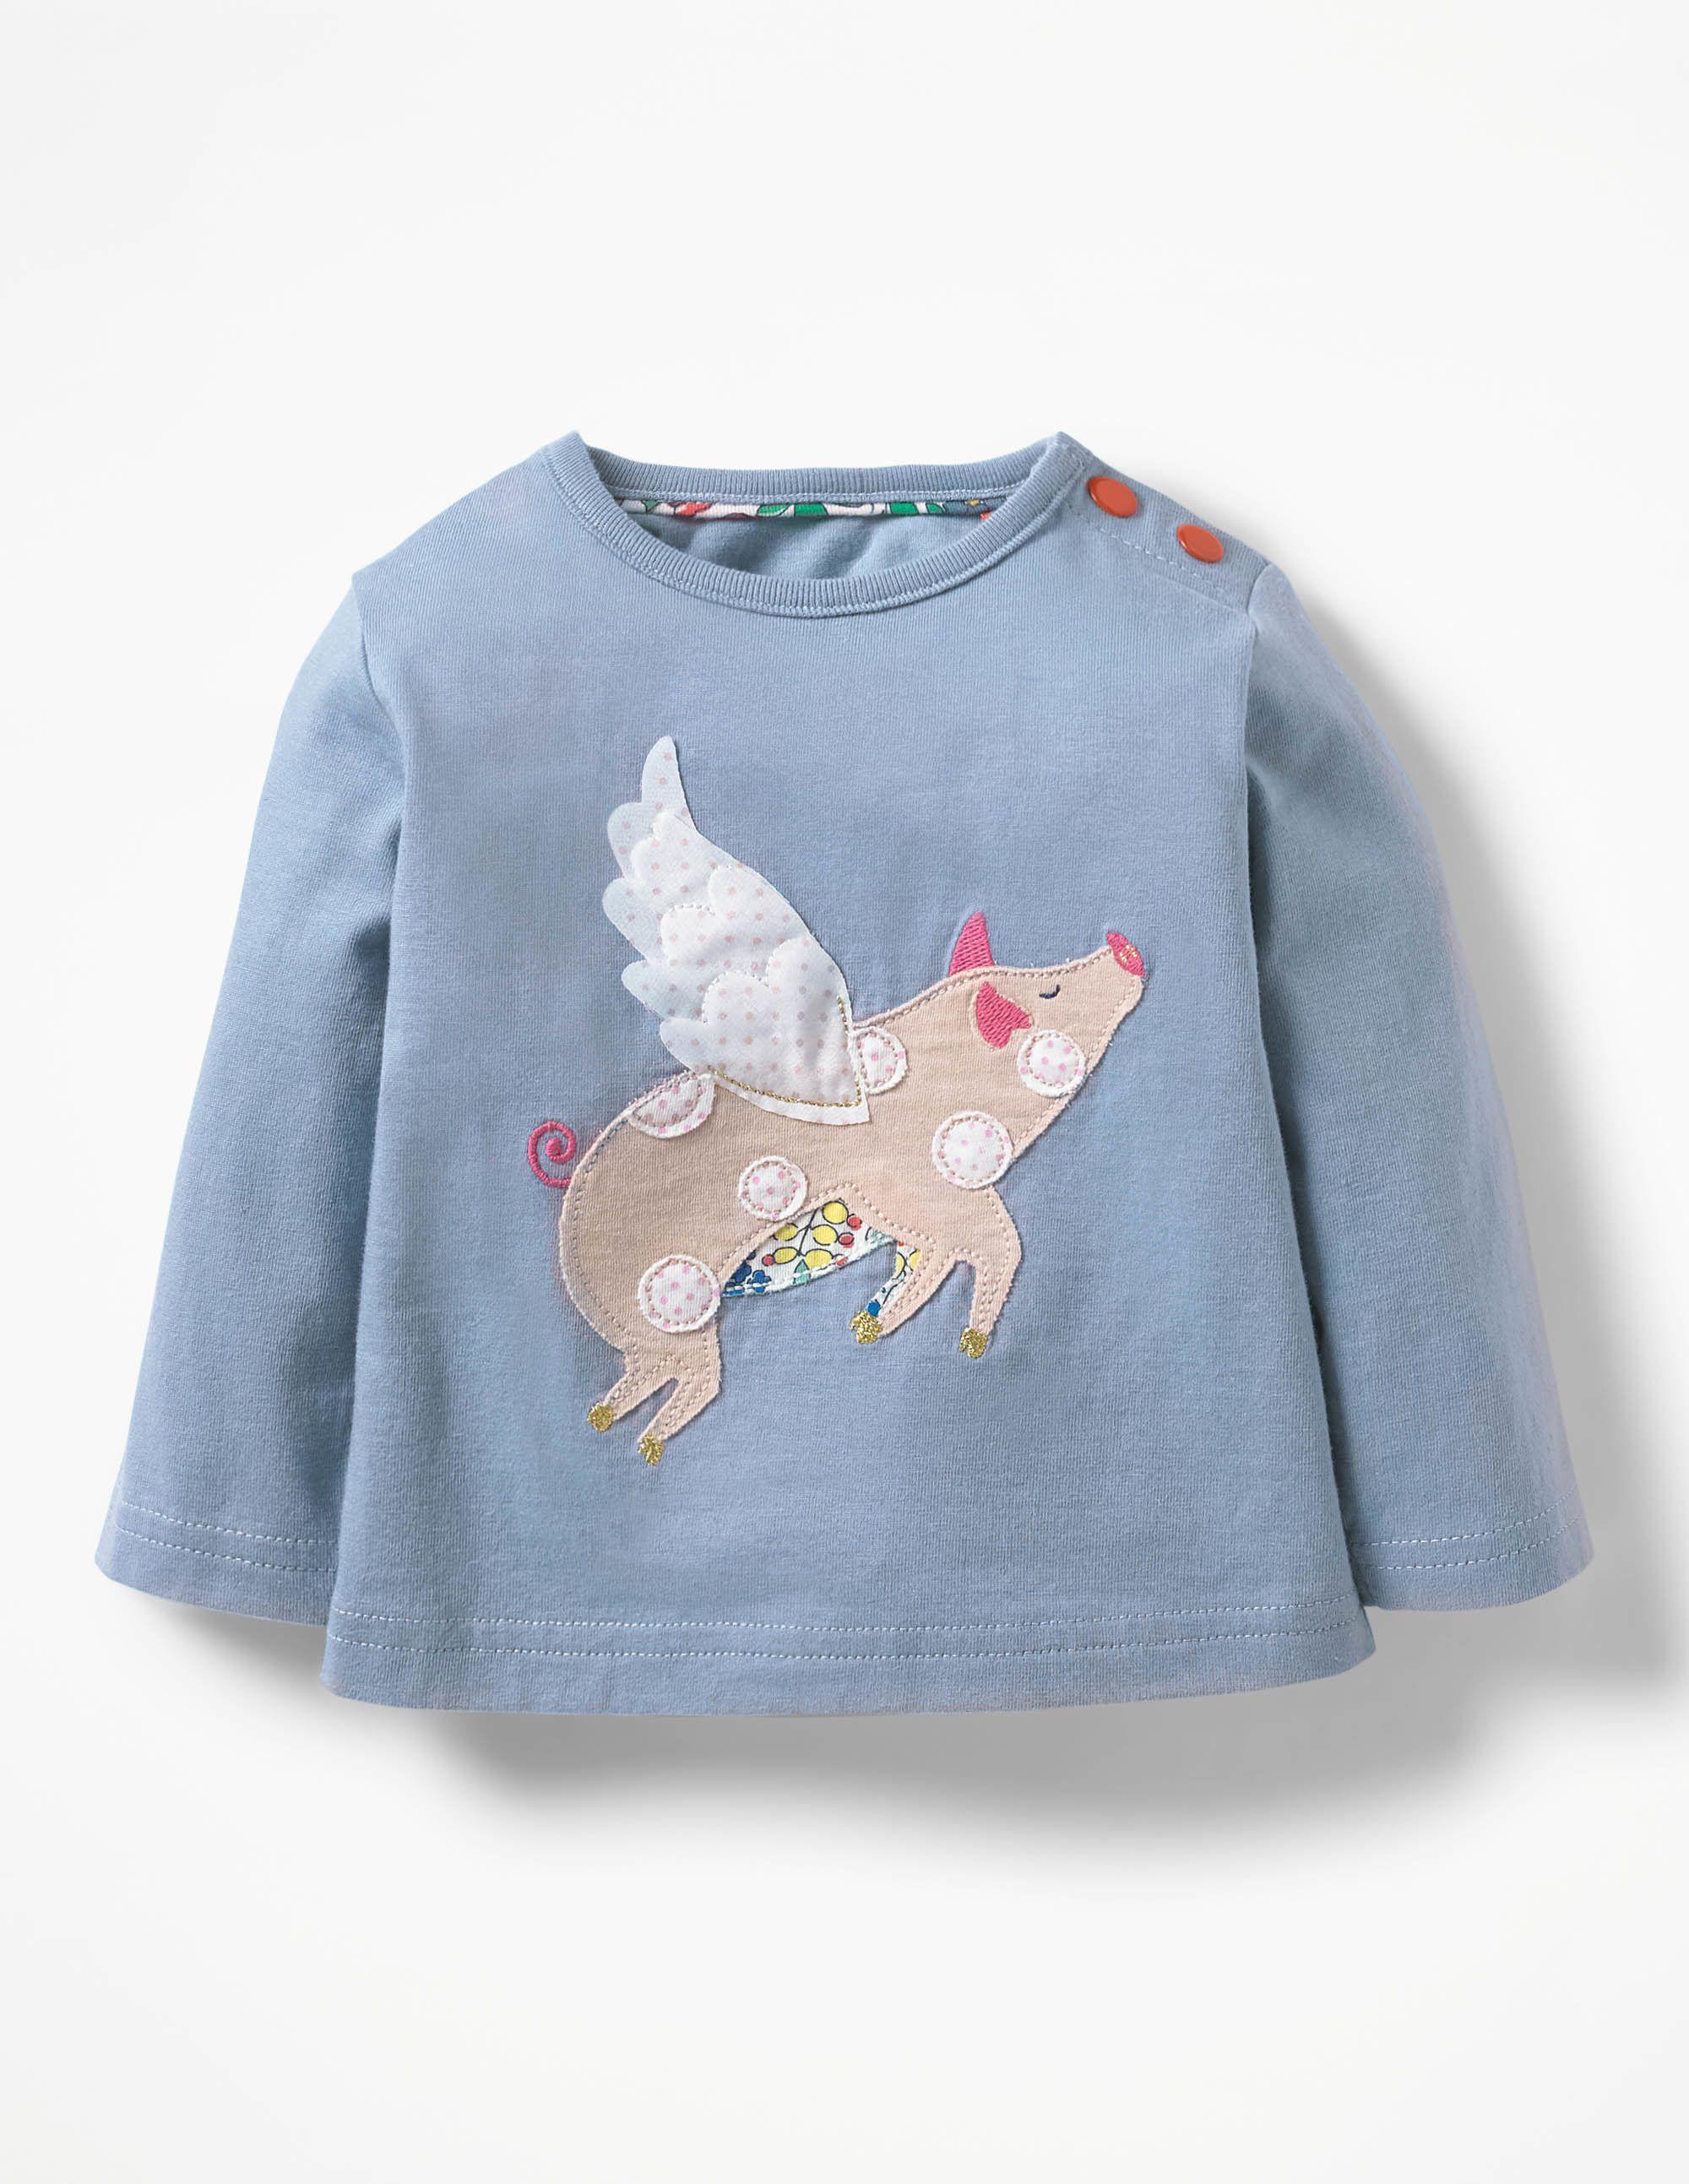 Baby Boden Farmyard Appliqué T-shirt in blue flying pig ...